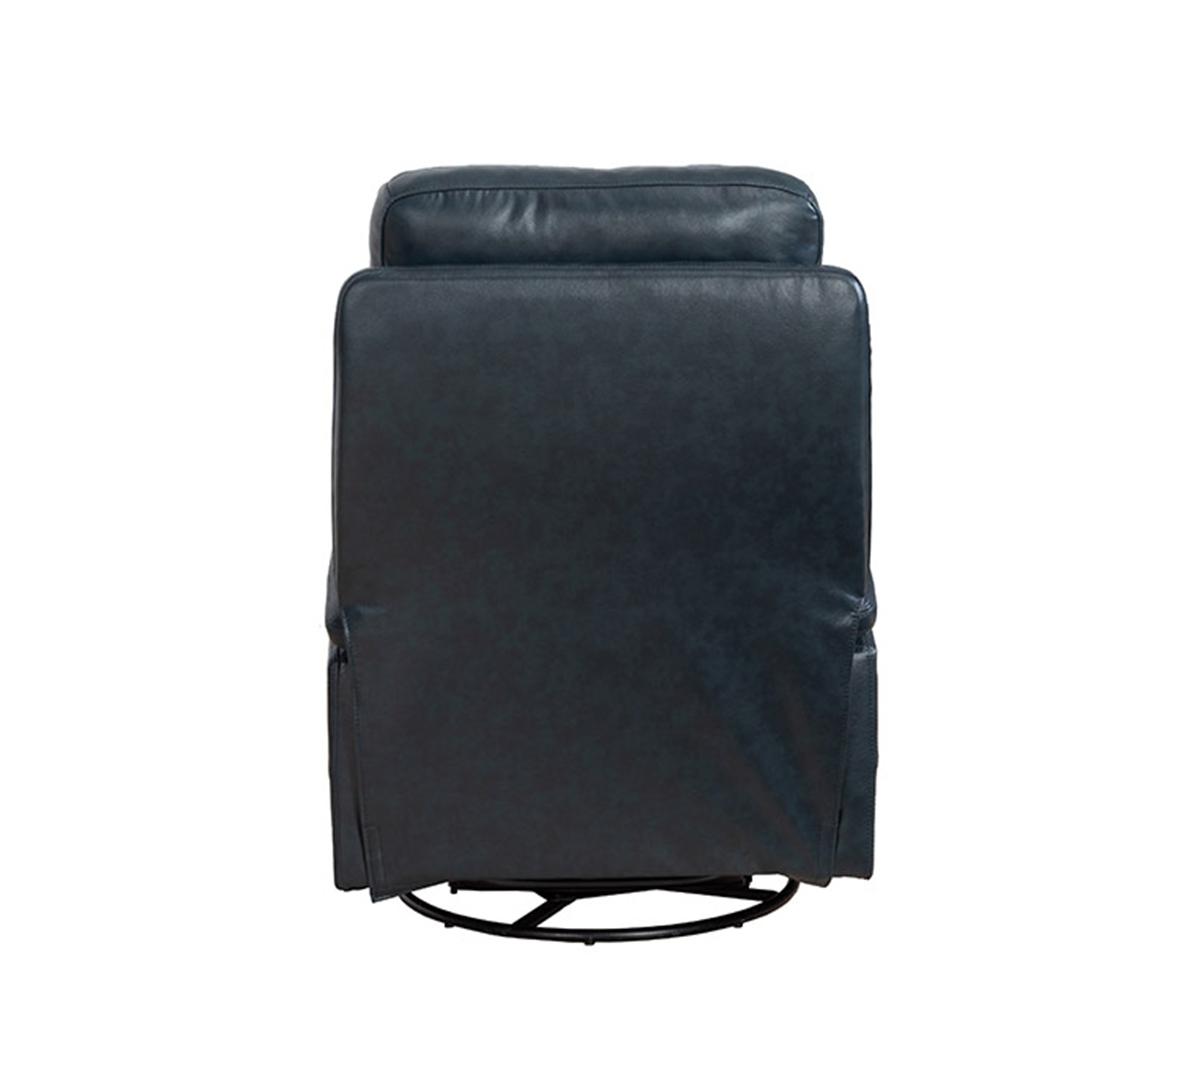 Barcalounger Duffy Swivel Glider Recliner Chair - Ryegate Sapphire Blue/Leather Match